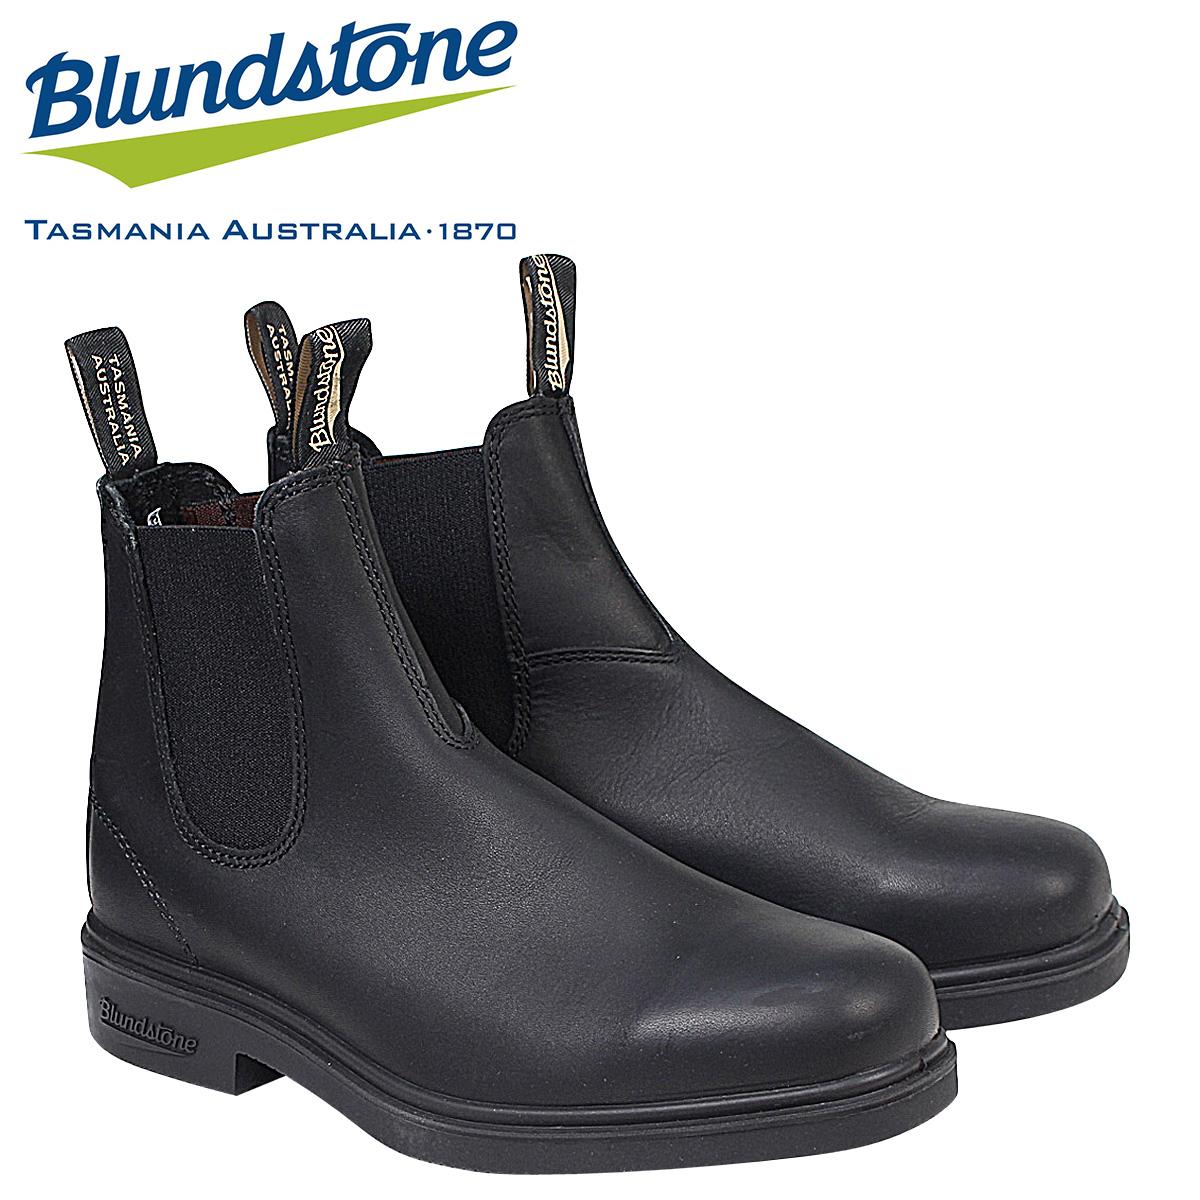 Blundstone DRESS CHELSEA BOOTS 063 ブランドストーン サイドゴア メンズ ブーツ ブラック